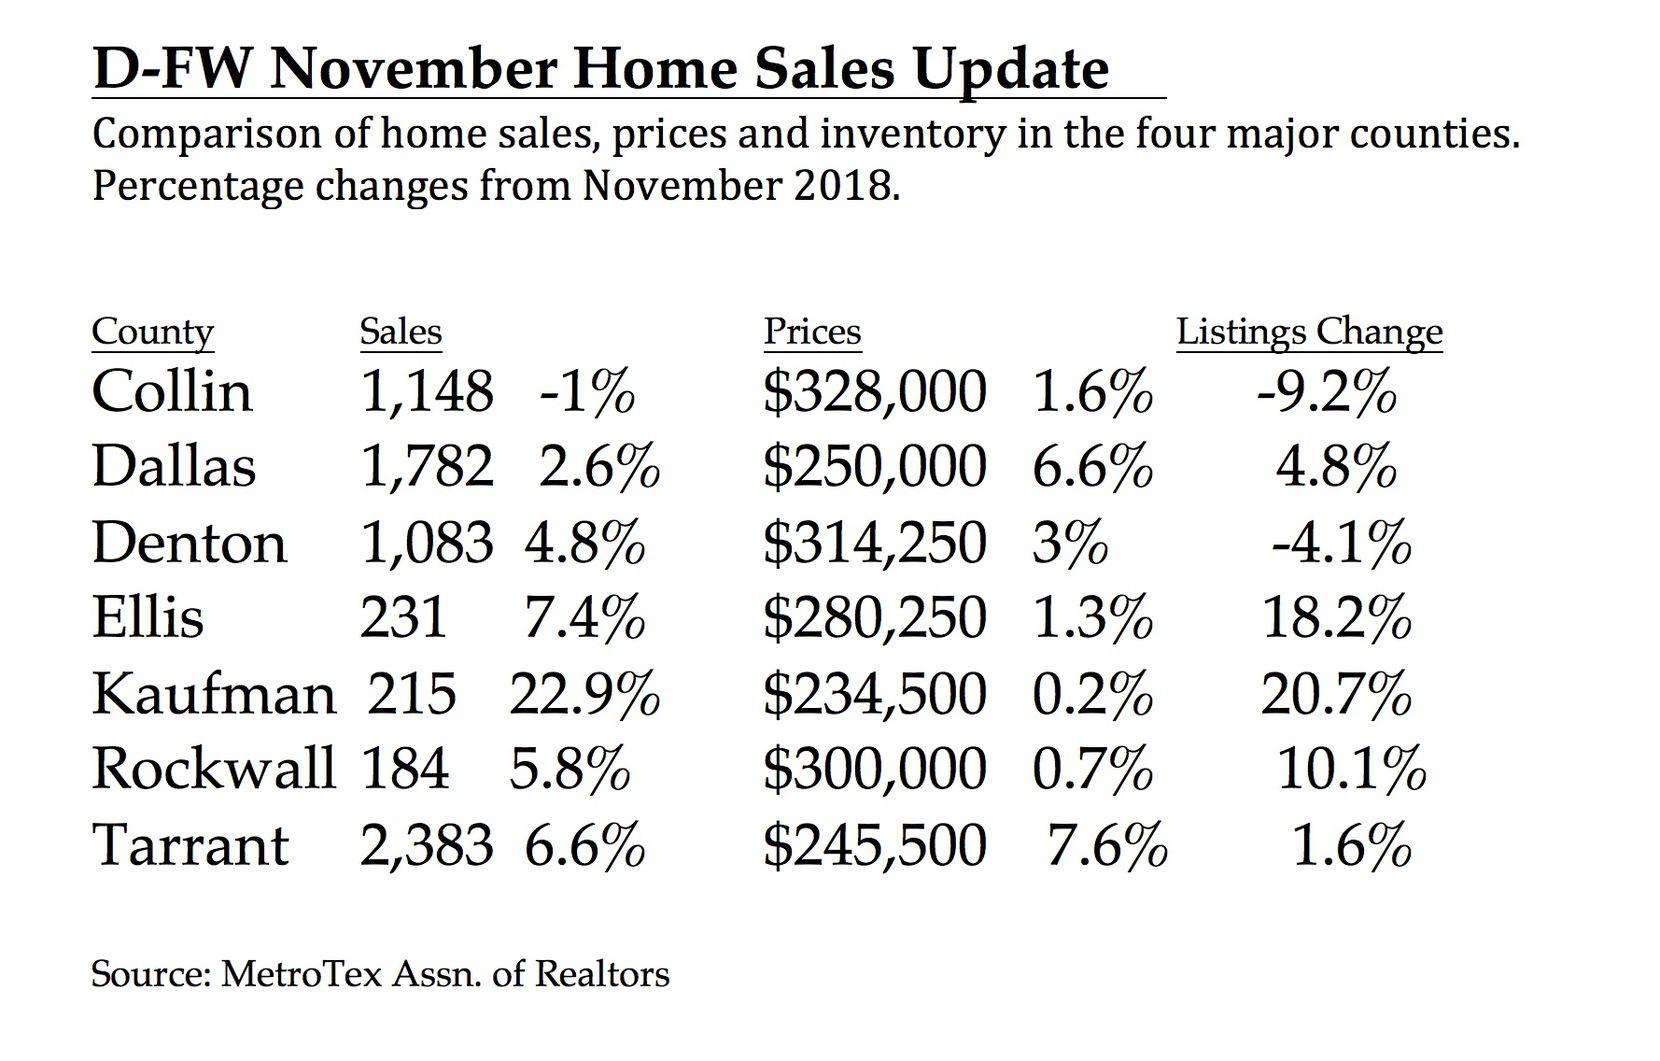 Collin County sales were down 1%.